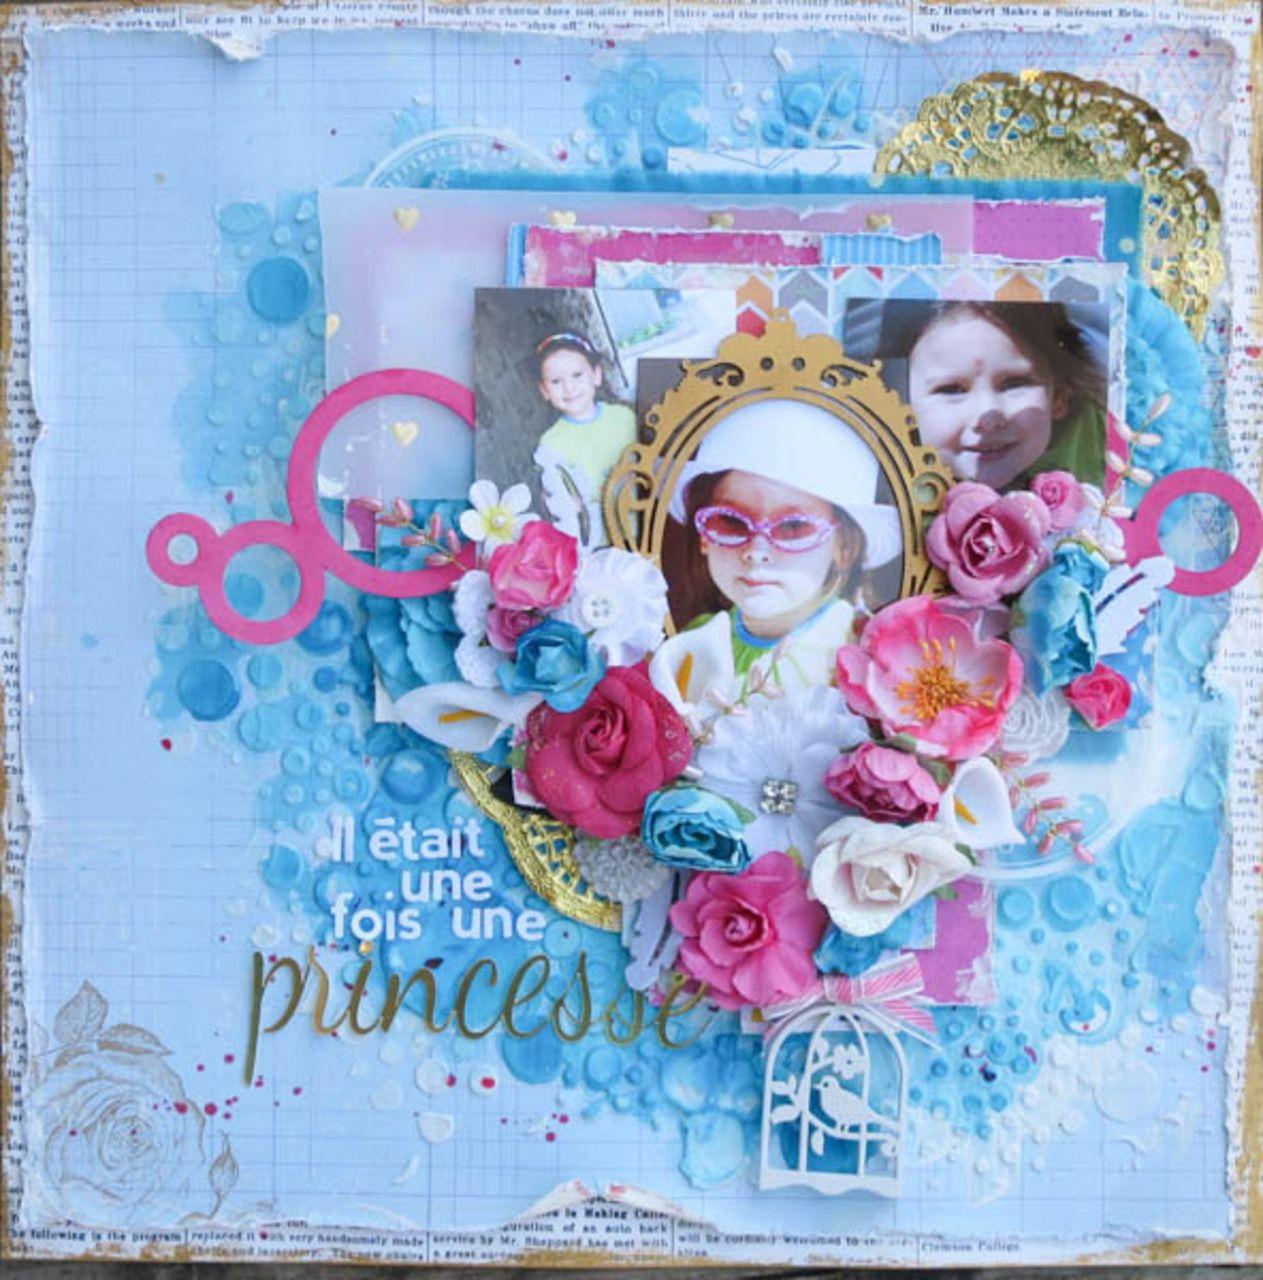 Vidéo: page Mixed Media Princesse http://www.carterieartisanale.com/blog/2014/07/30/video-page-mixed-media-princesse/